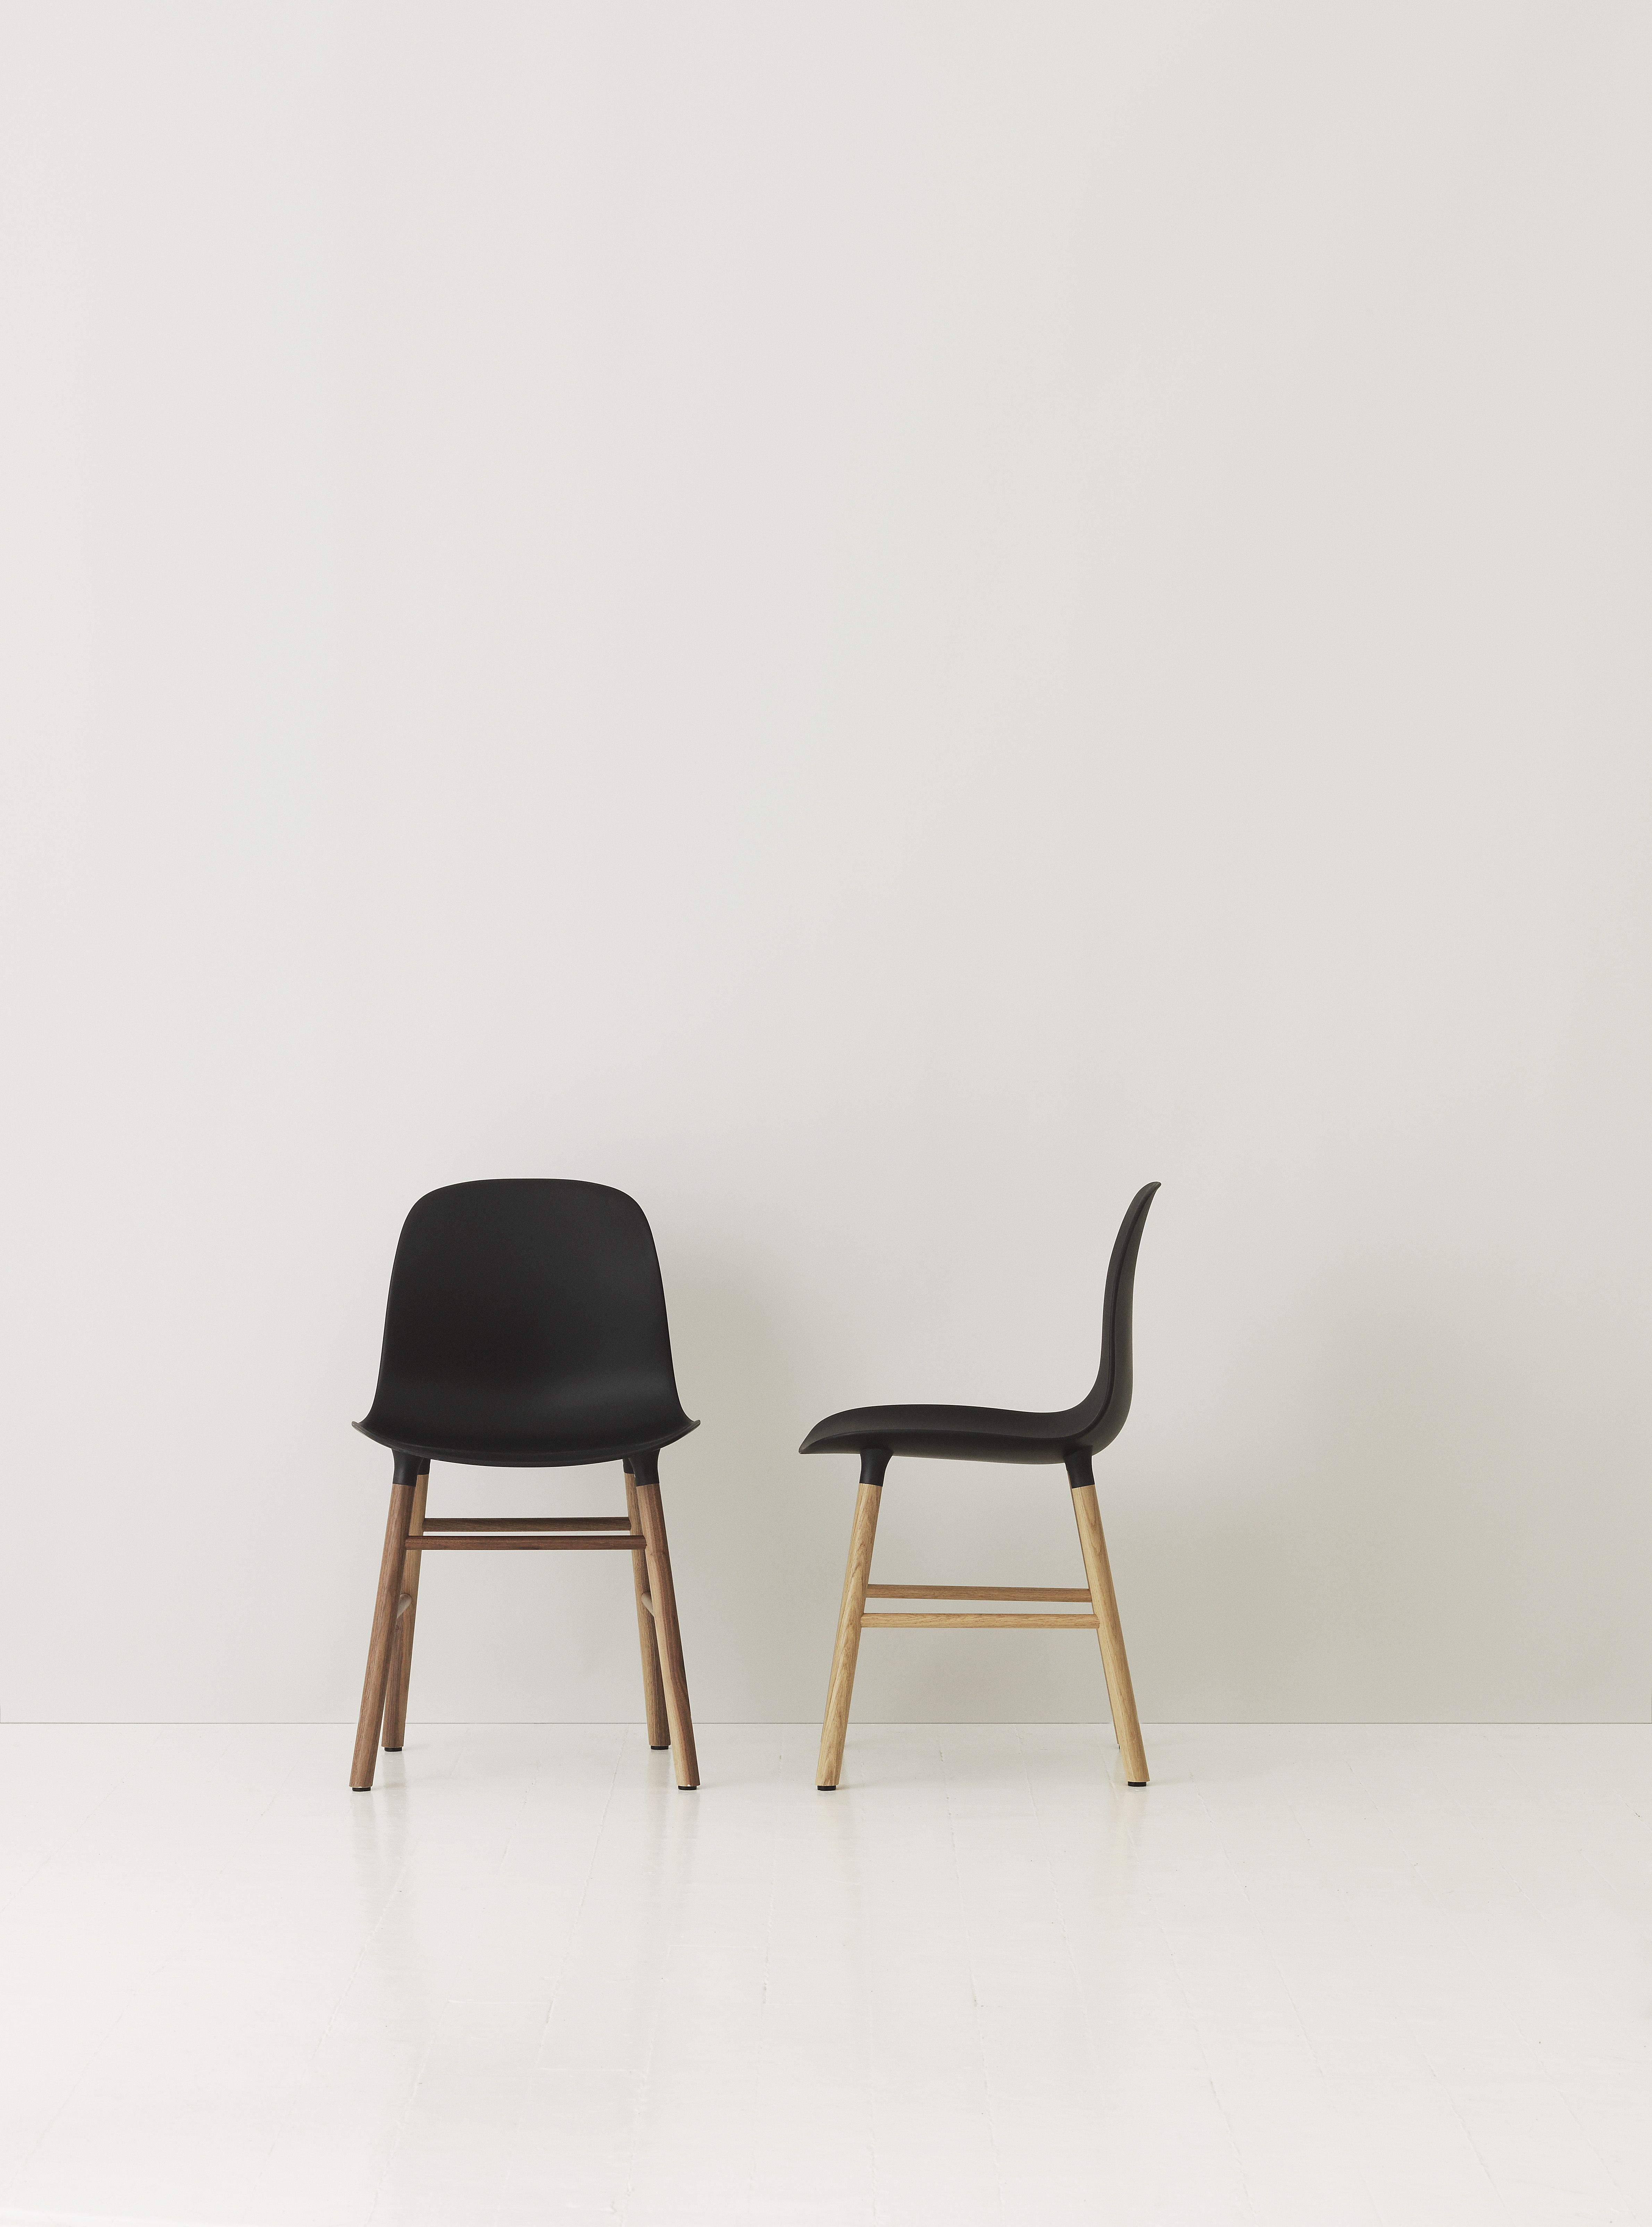 Stoelen Design Tweedehands.Decospot Chairs Normann Copenhagen Form Chair Available At